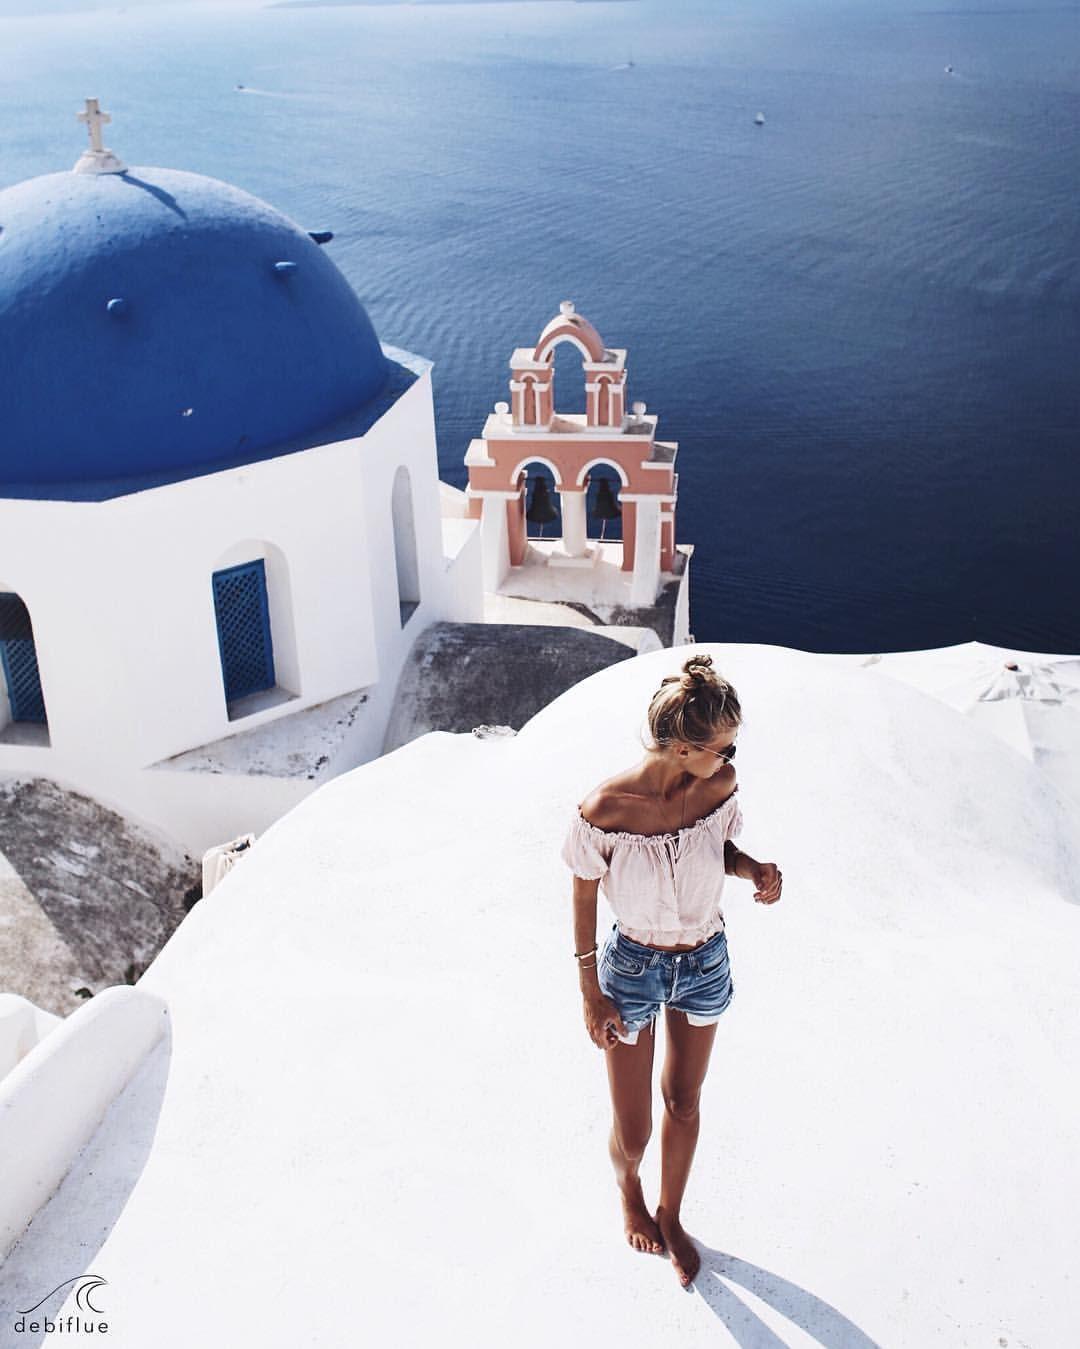 Feet Alyson Michalka nudes (36 photos), Sexy, Paparazzi, Instagram, panties 2019